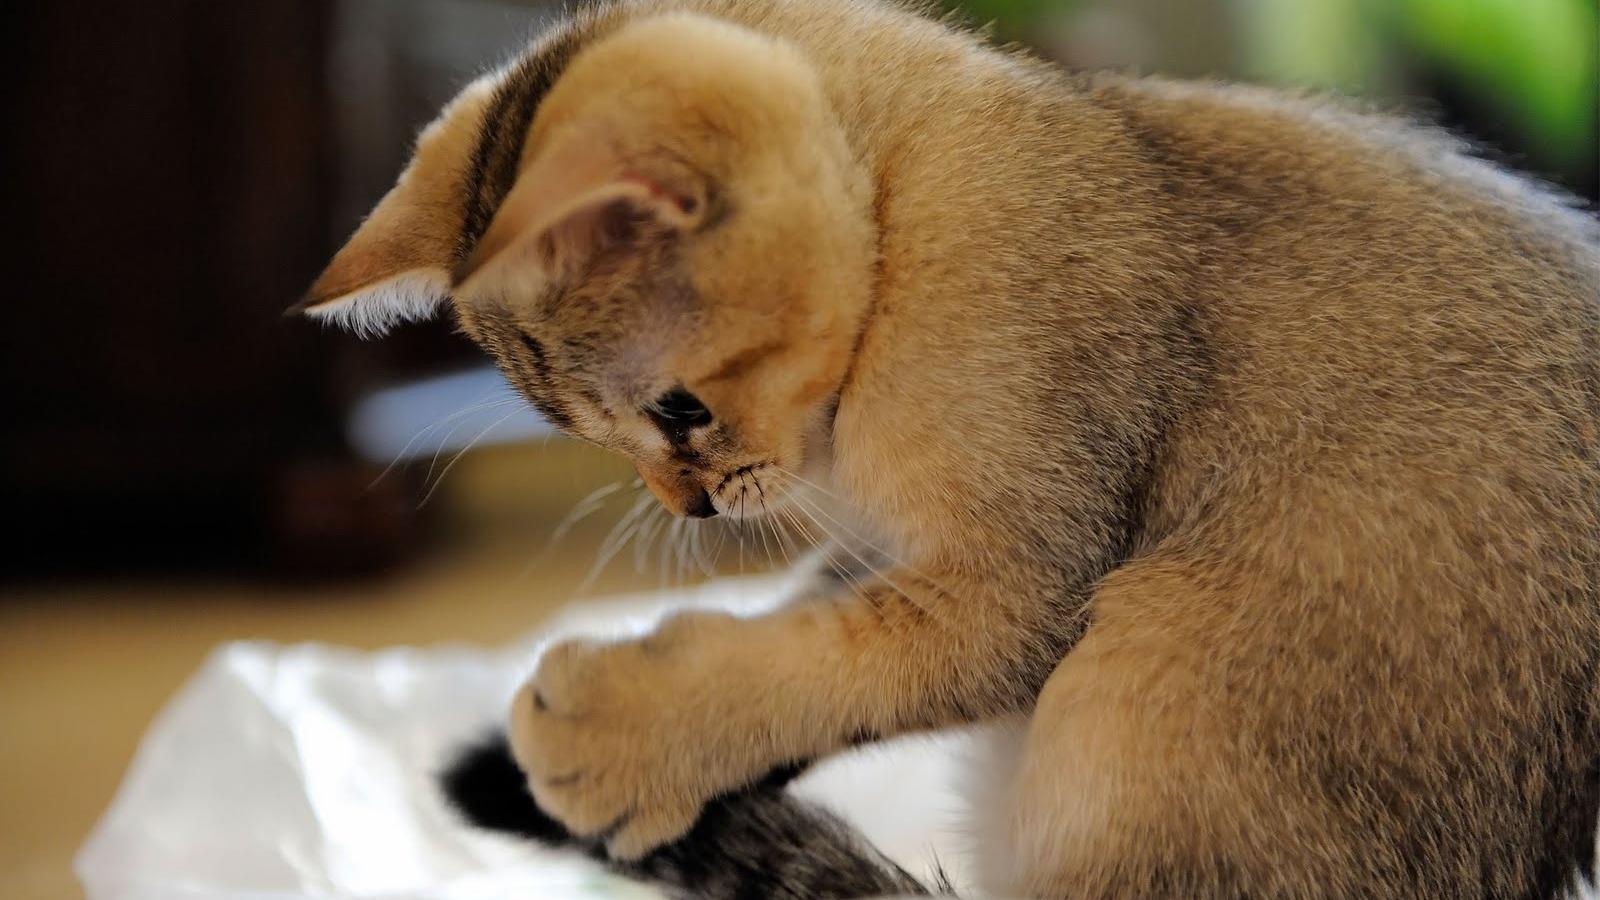 Terkeren 30 Wallpaper Kucing Lucu Imut - Kumpulan Gambar Lucu